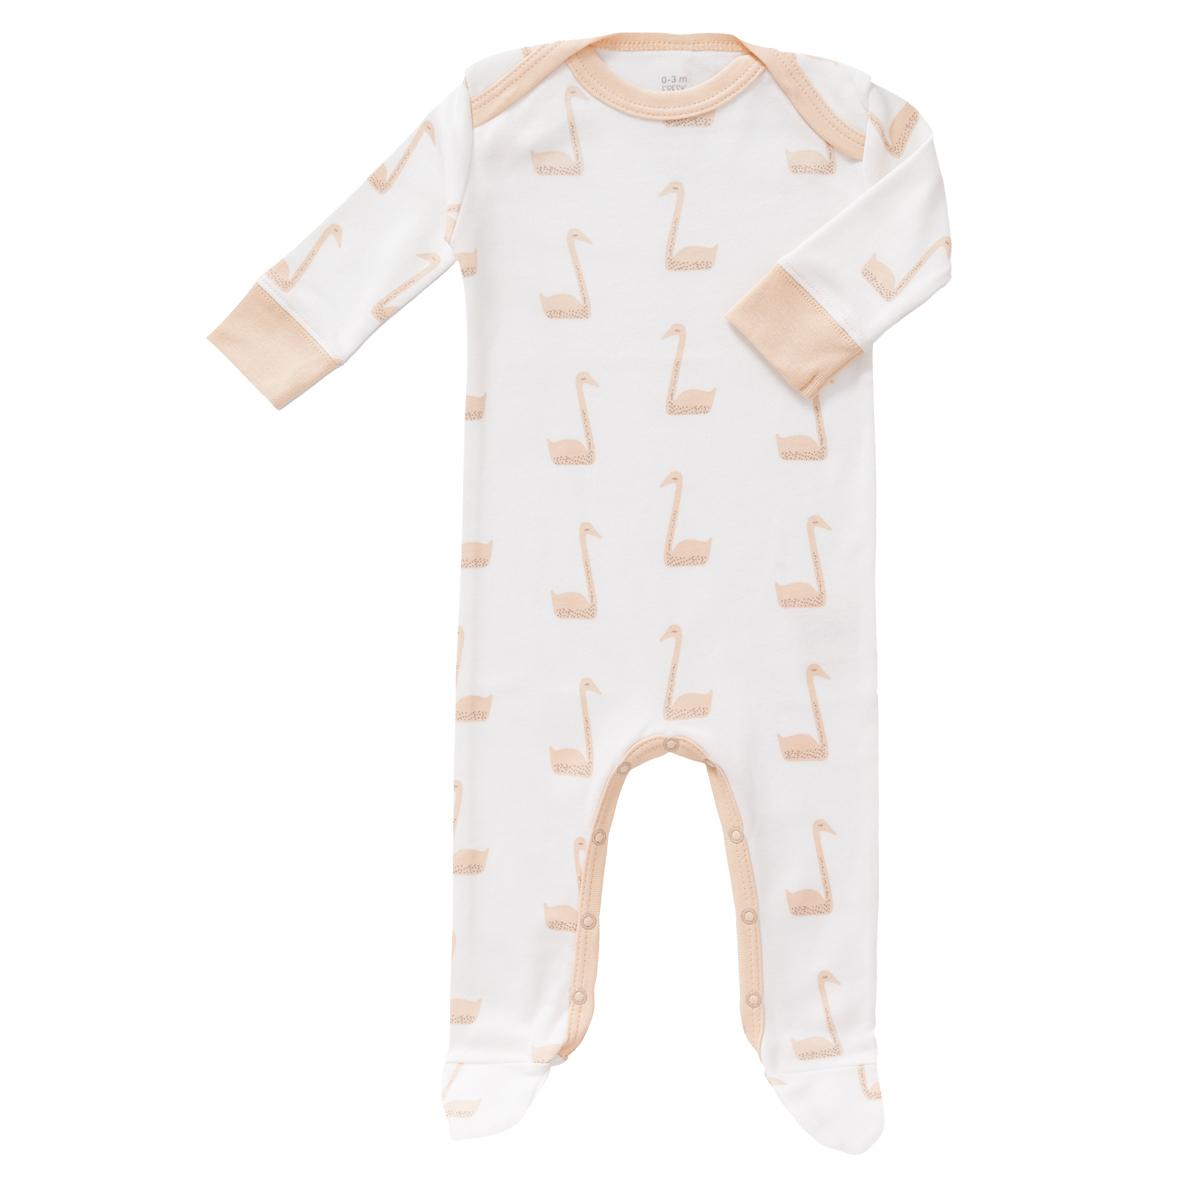 Body & Pyjama Pyjama Cygne - 3/6 Mois Pyjama Cygne - 3/6 Mois